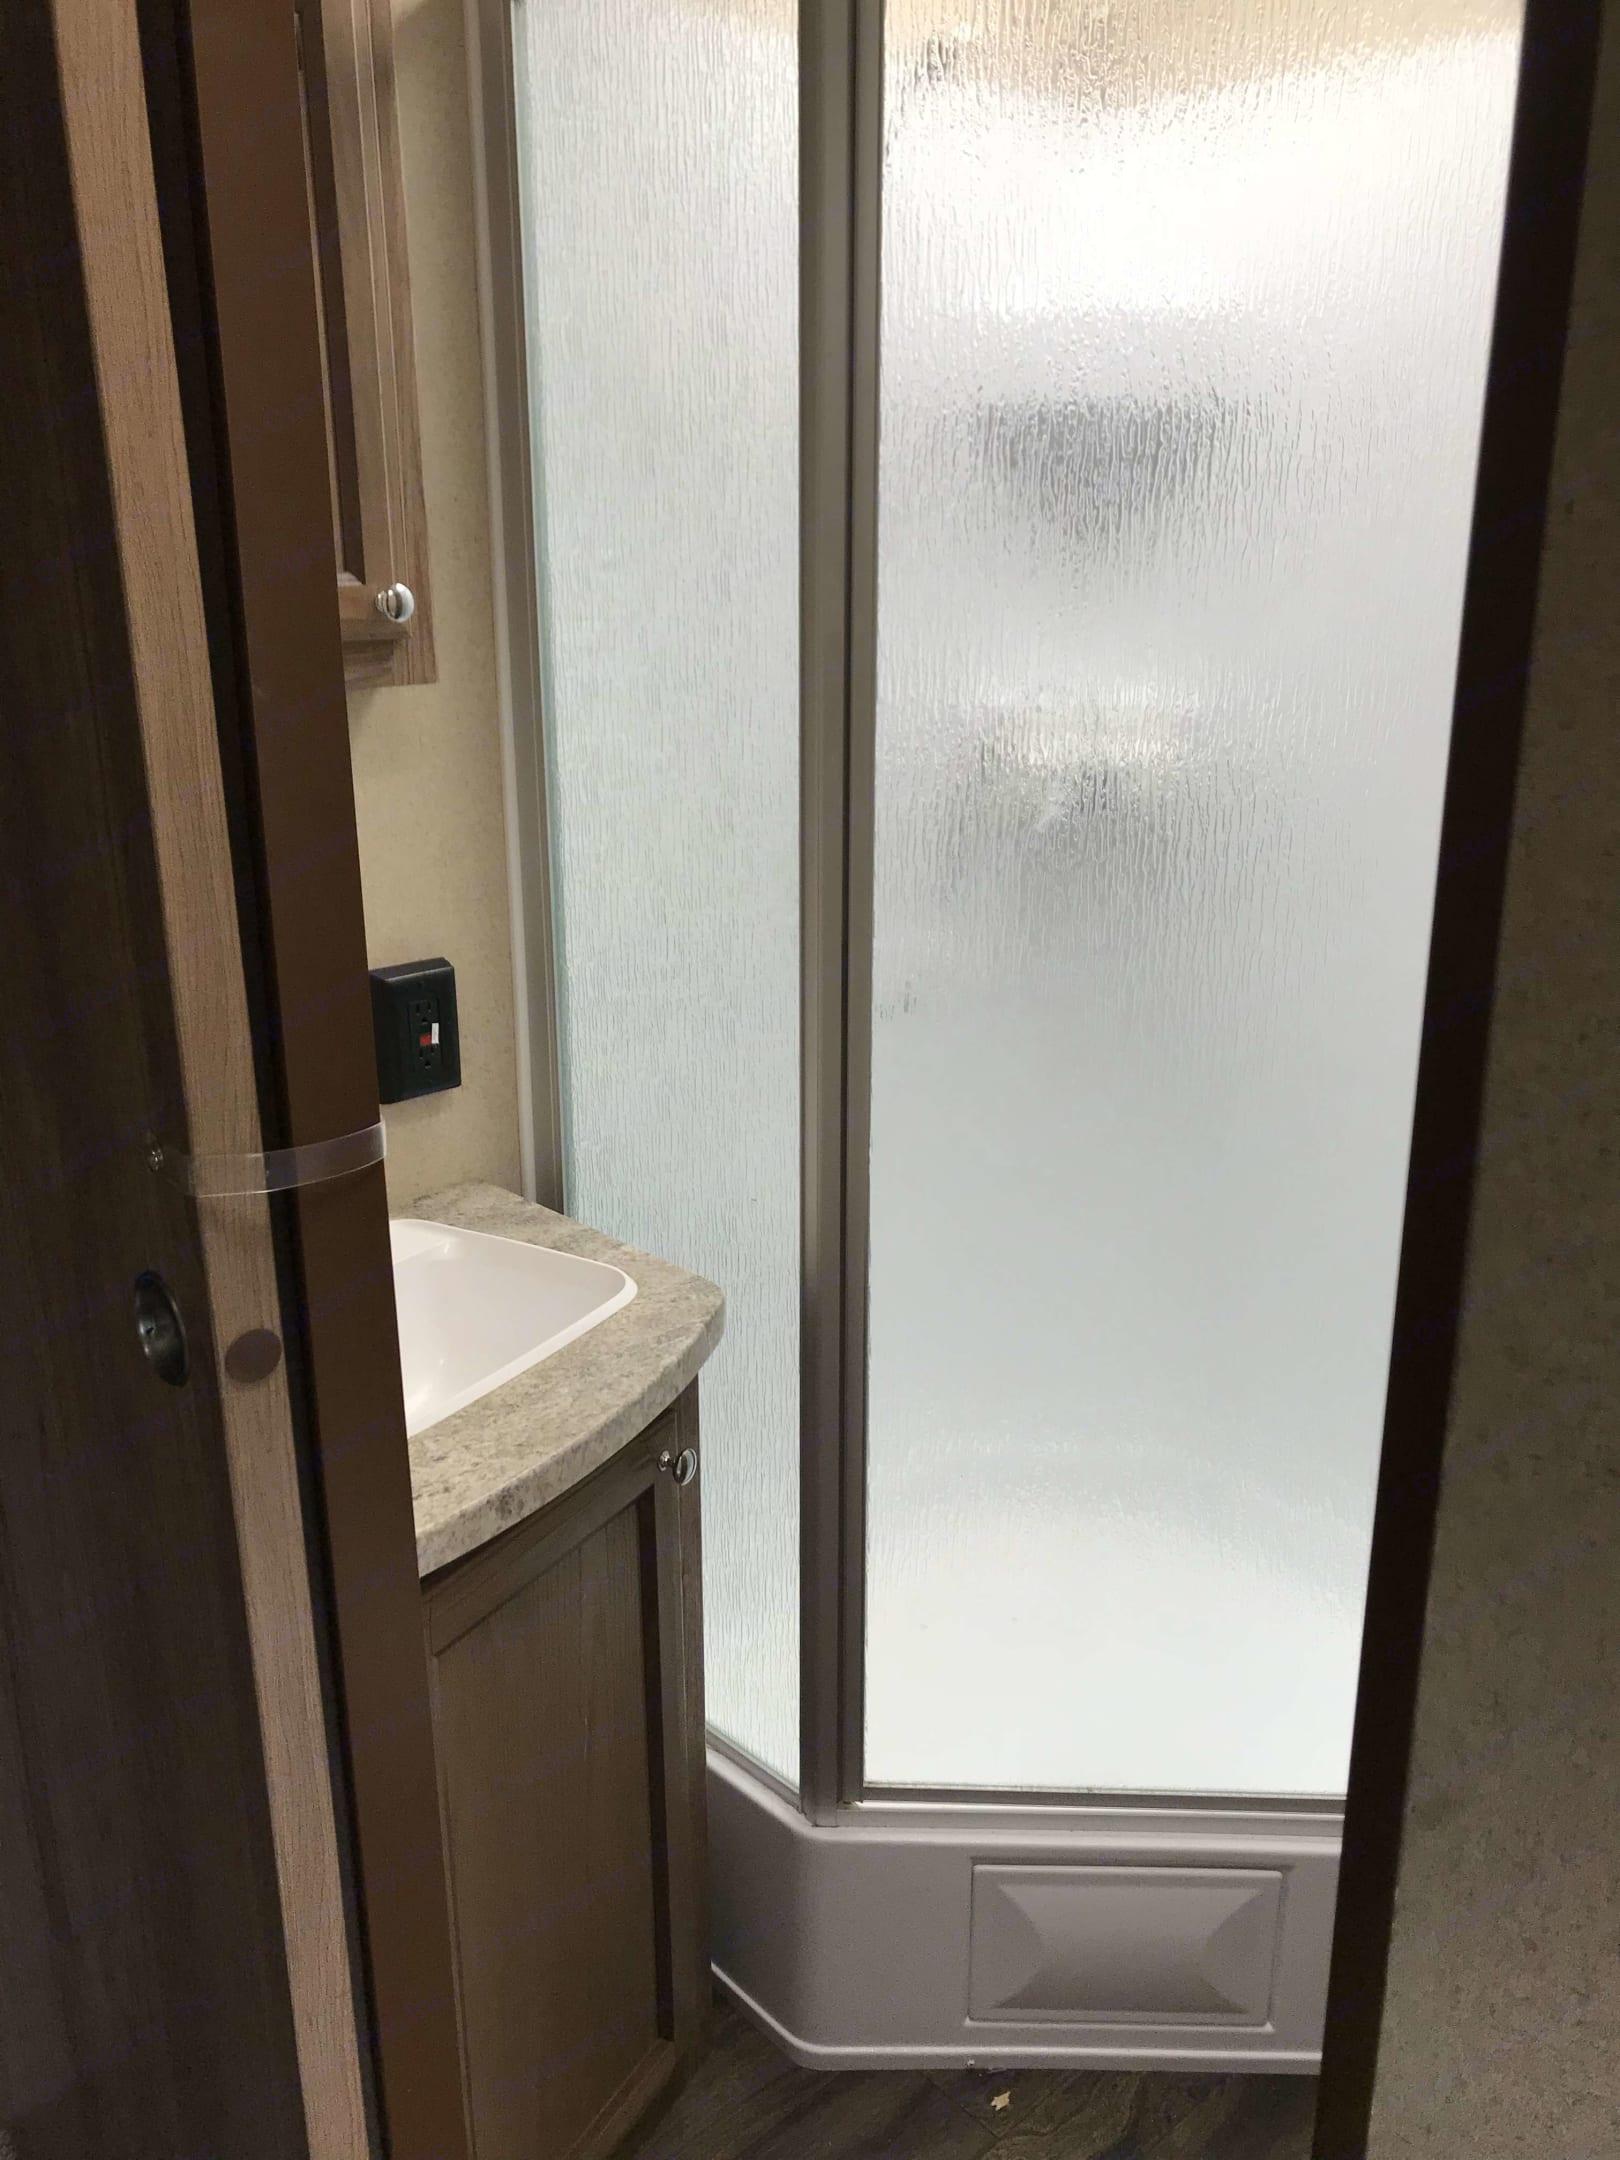 Bathroom SEA enclosed shower. Forest River Revere 2017